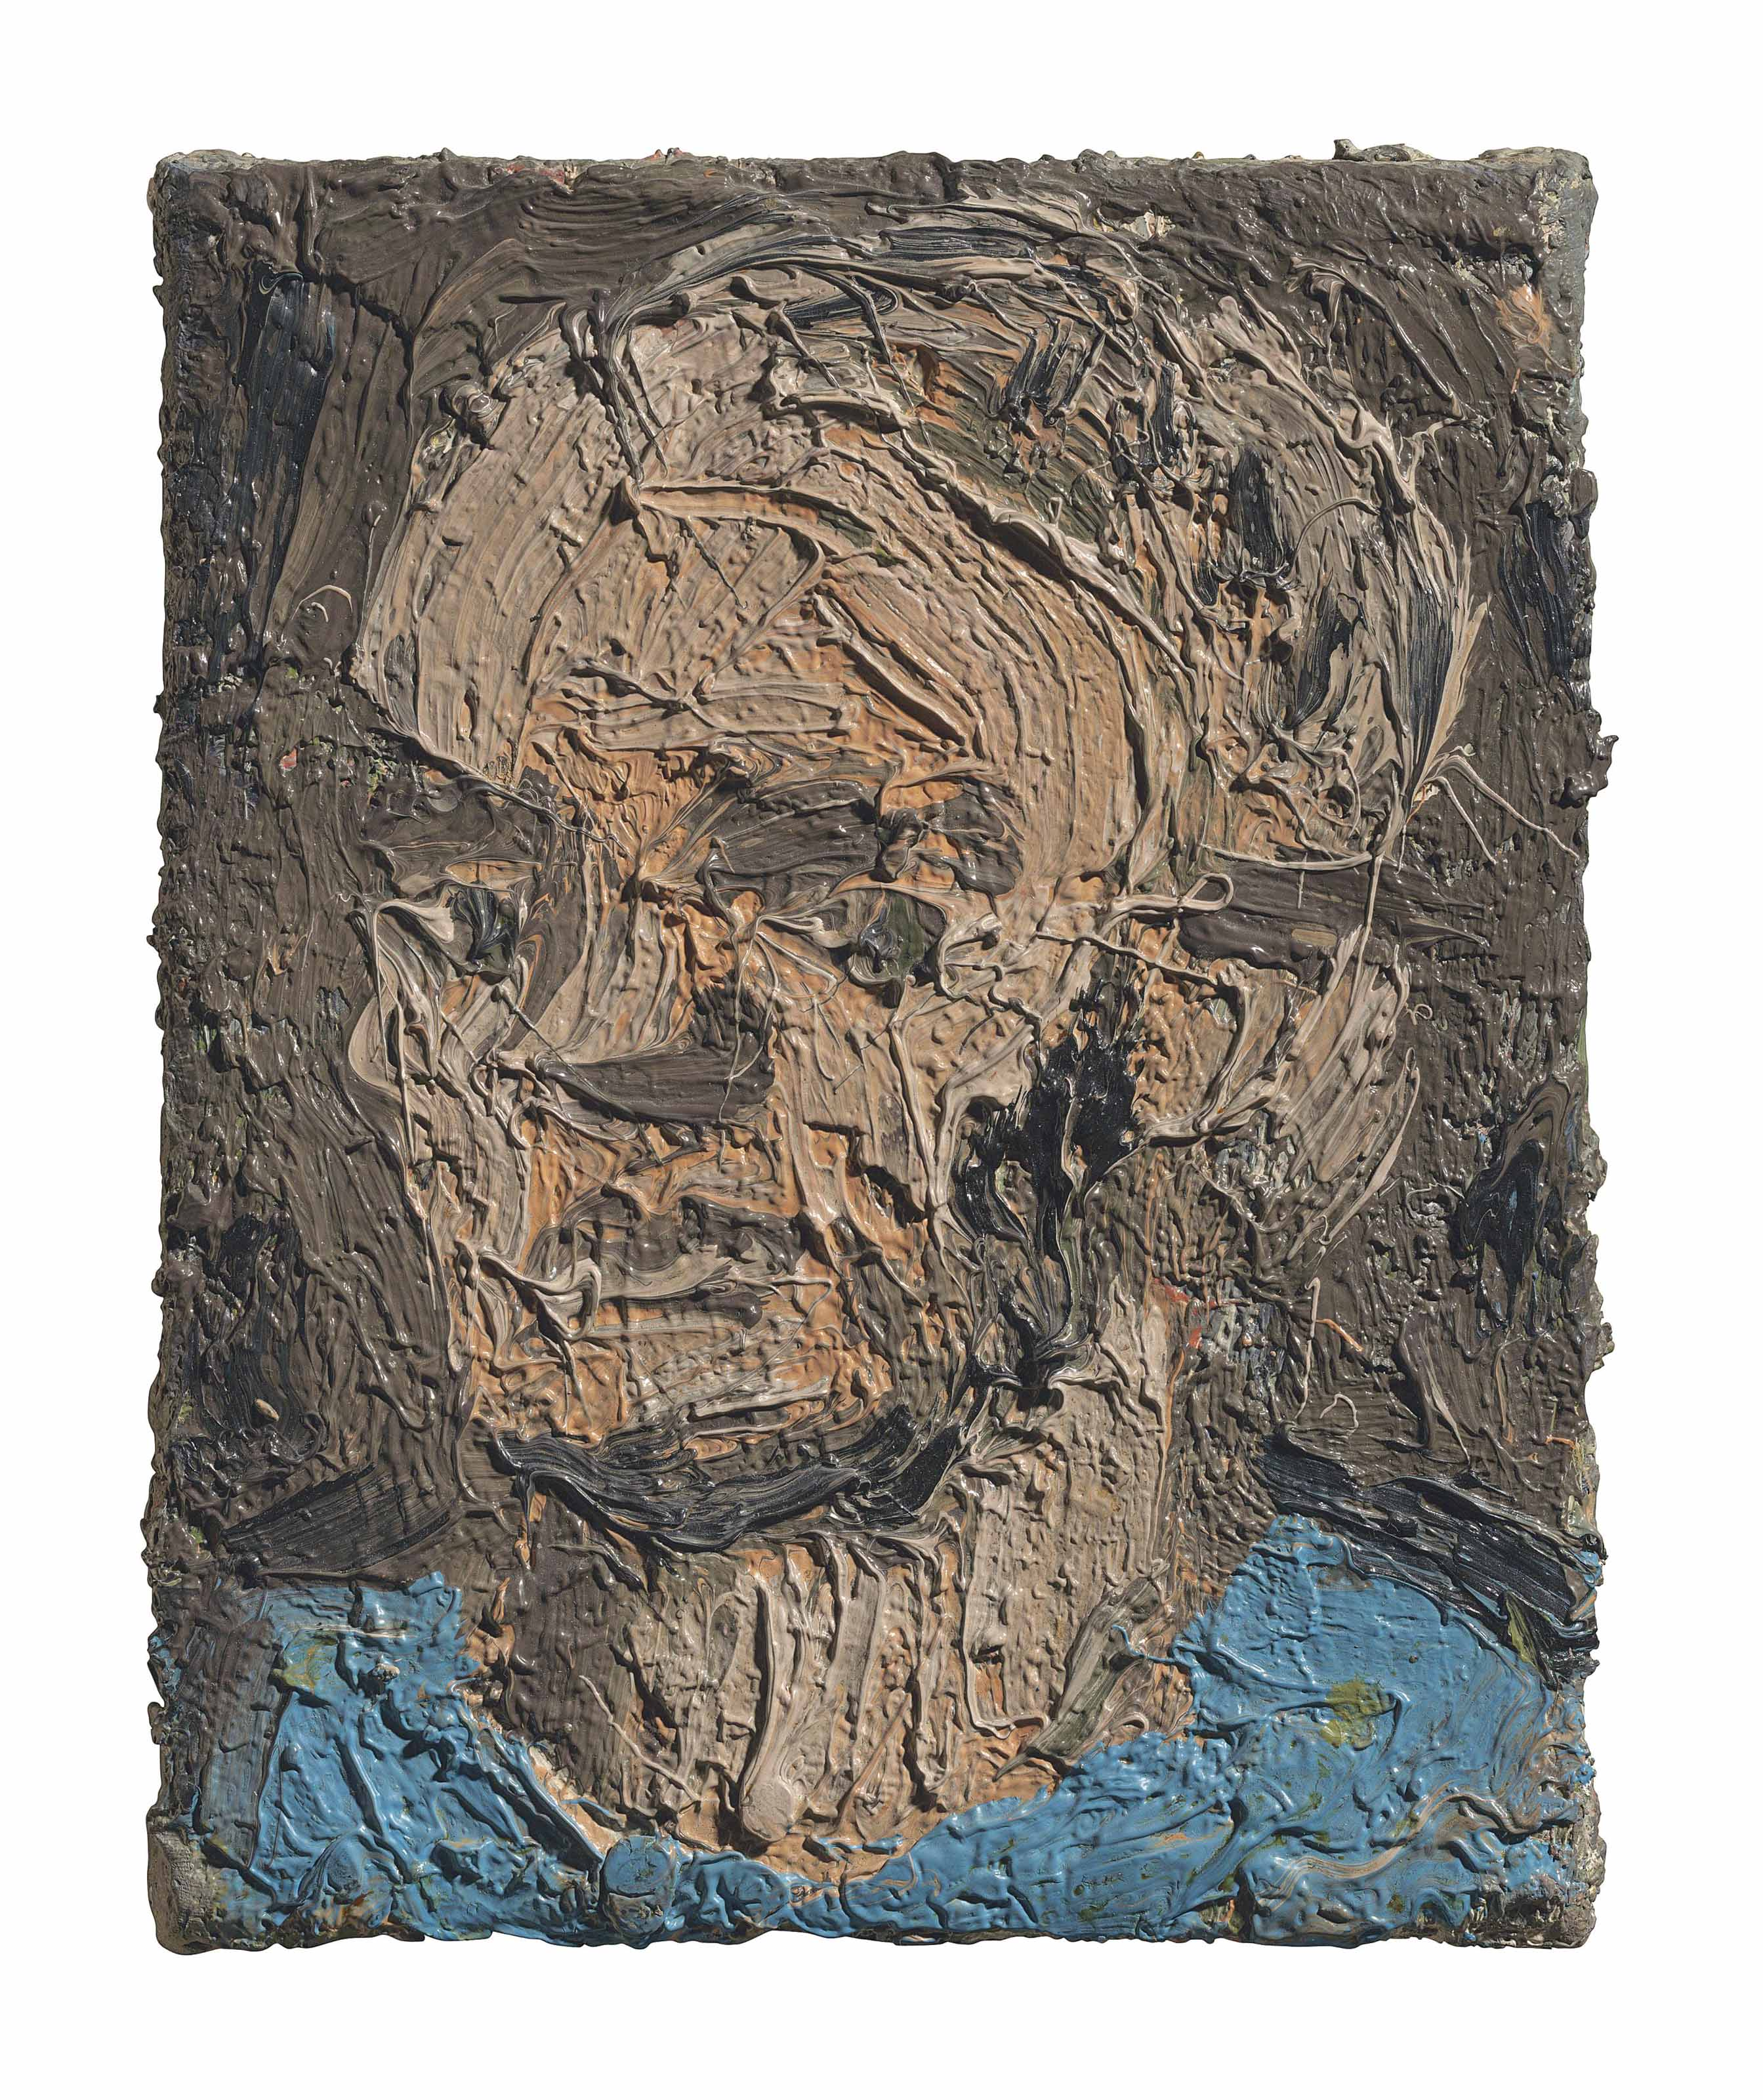 Leon Kossoff (b. 1926)